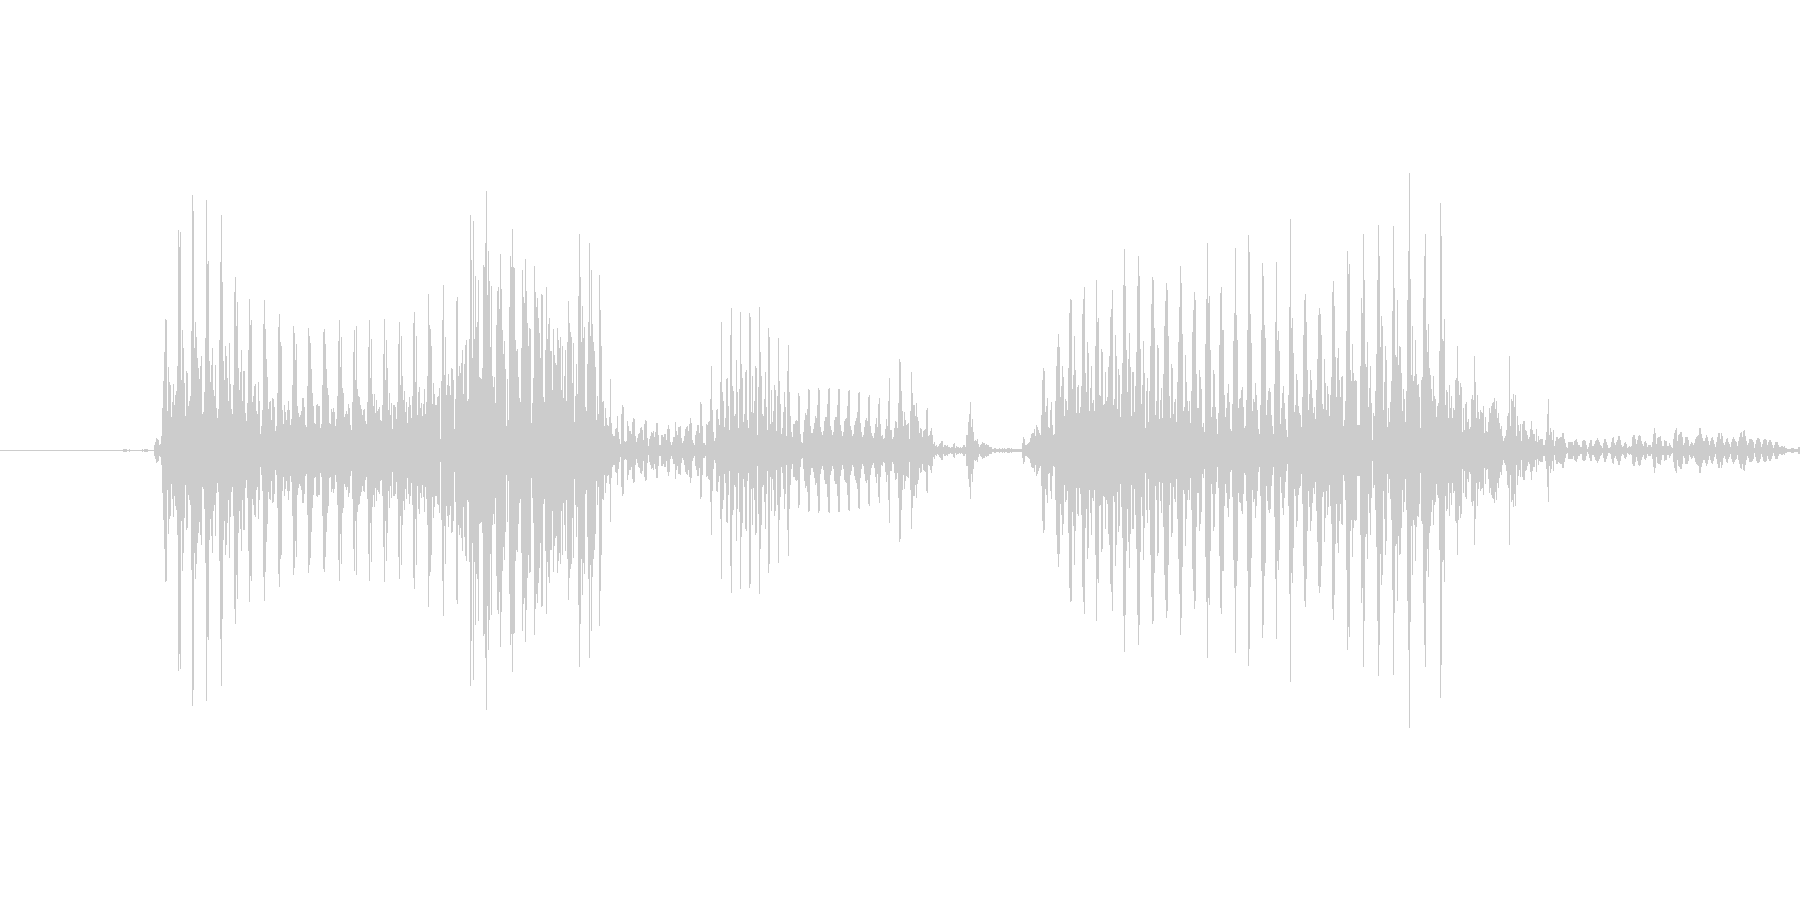 「11 AM」英語発音の未再生の波形